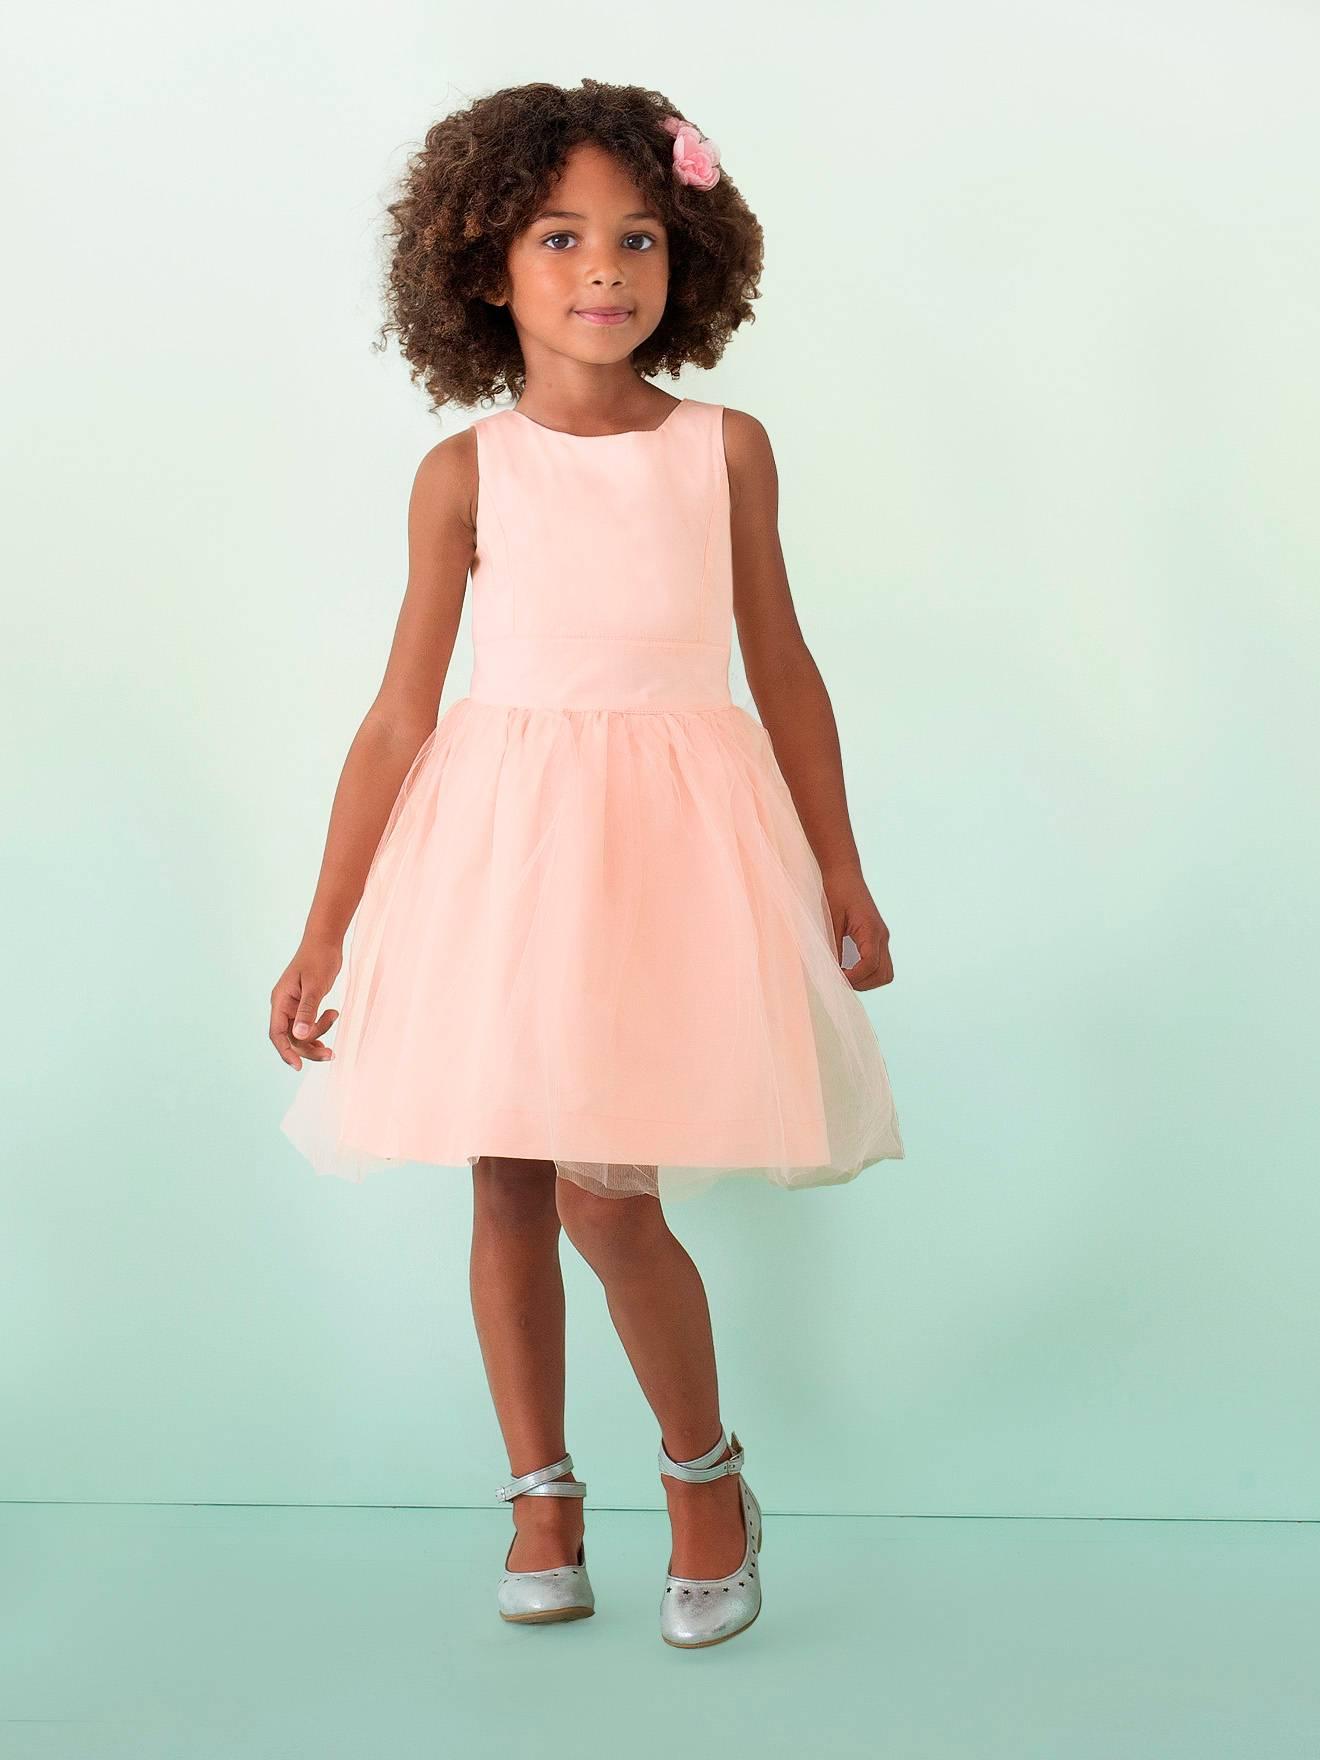 vertbaudet mekko jossa tyllihame keltainen lapset. Black Bedroom Furniture Sets. Home Design Ideas